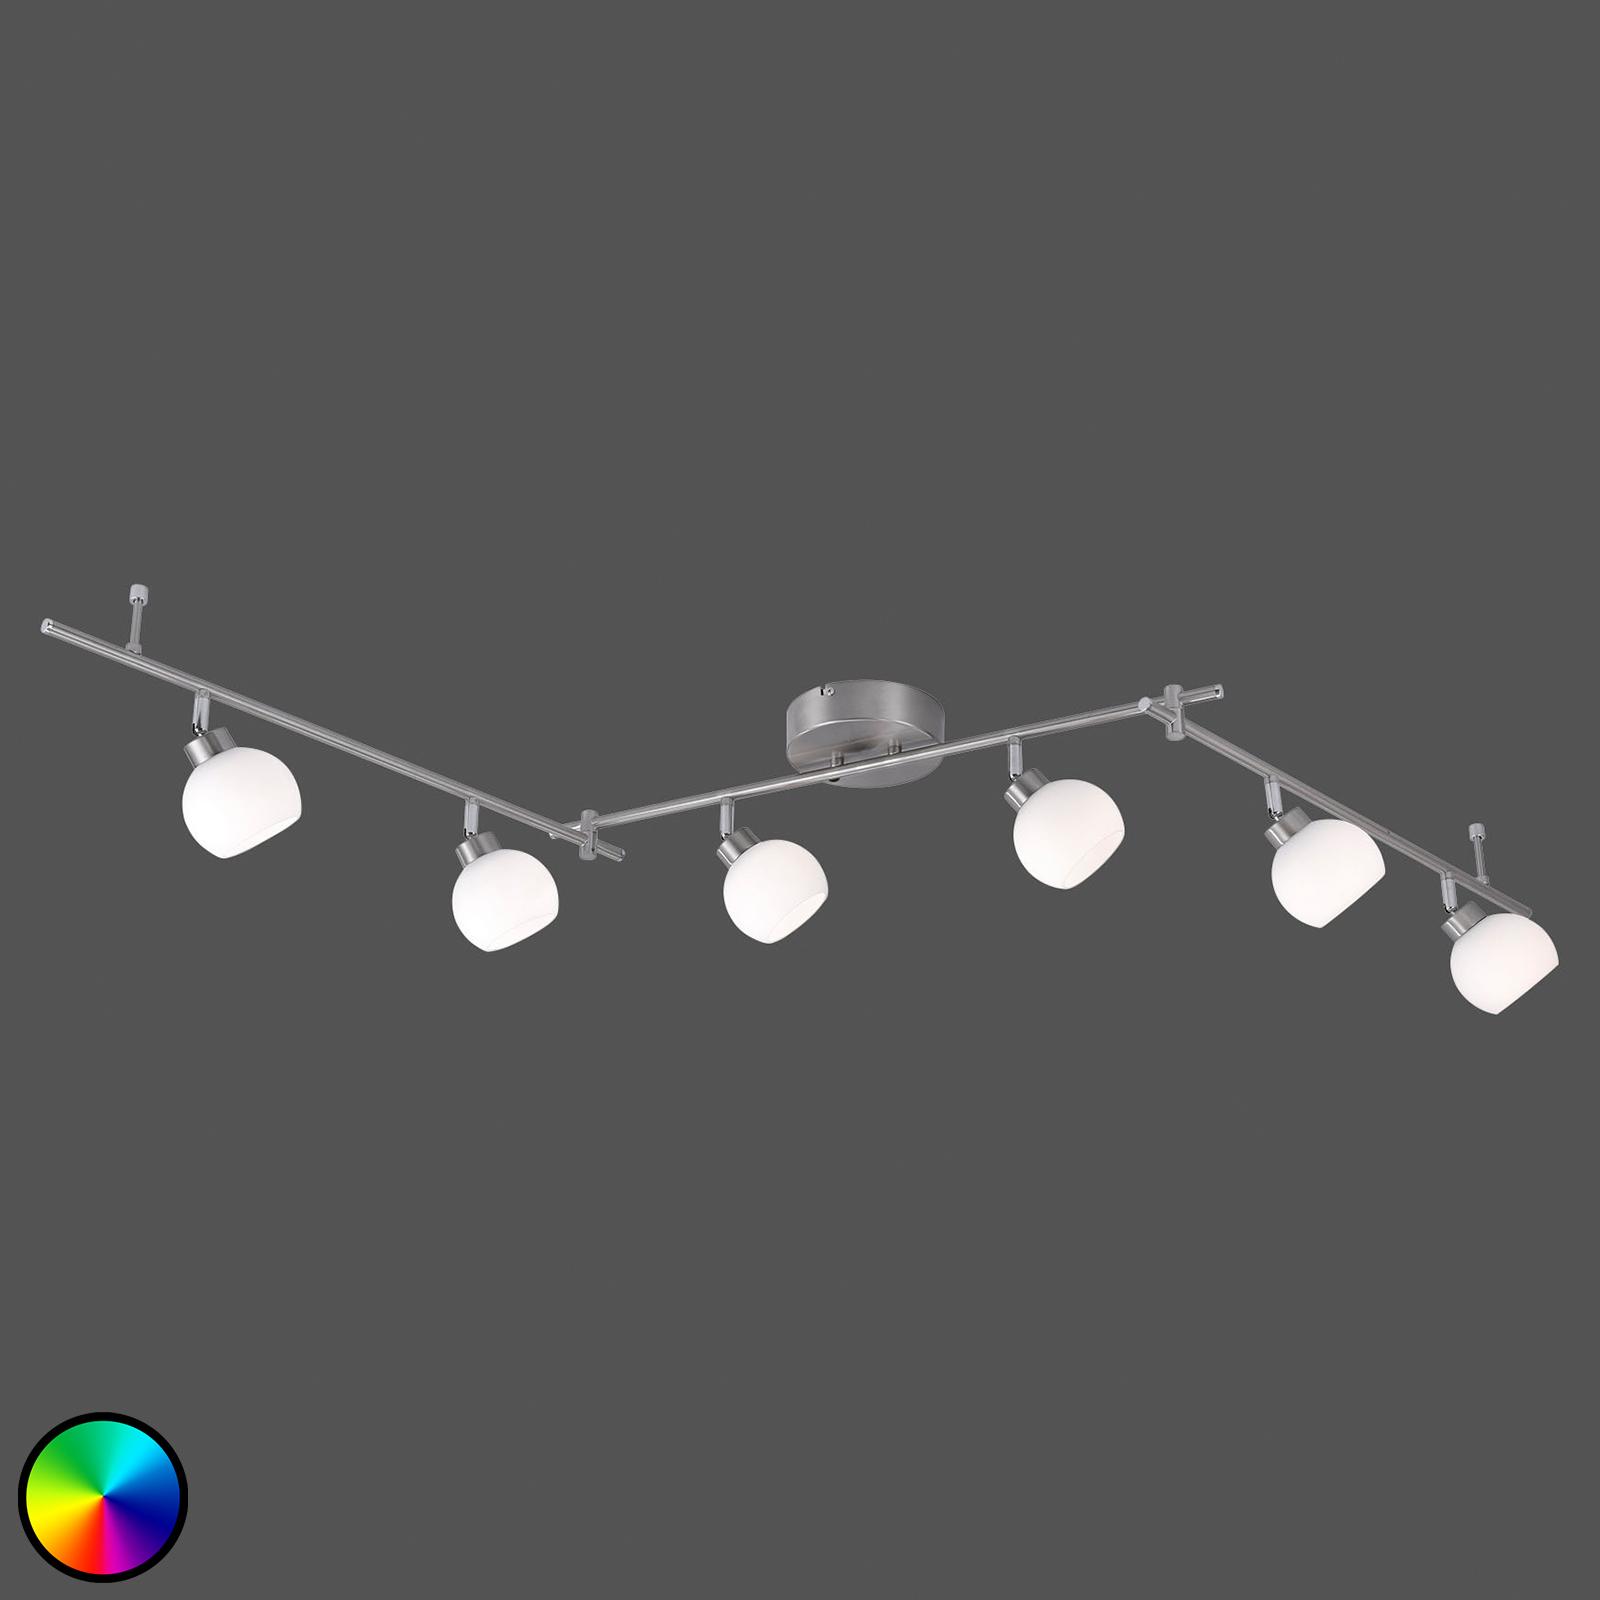 LED plafondlamp Yaeka 6-lamps, afstandsbediening